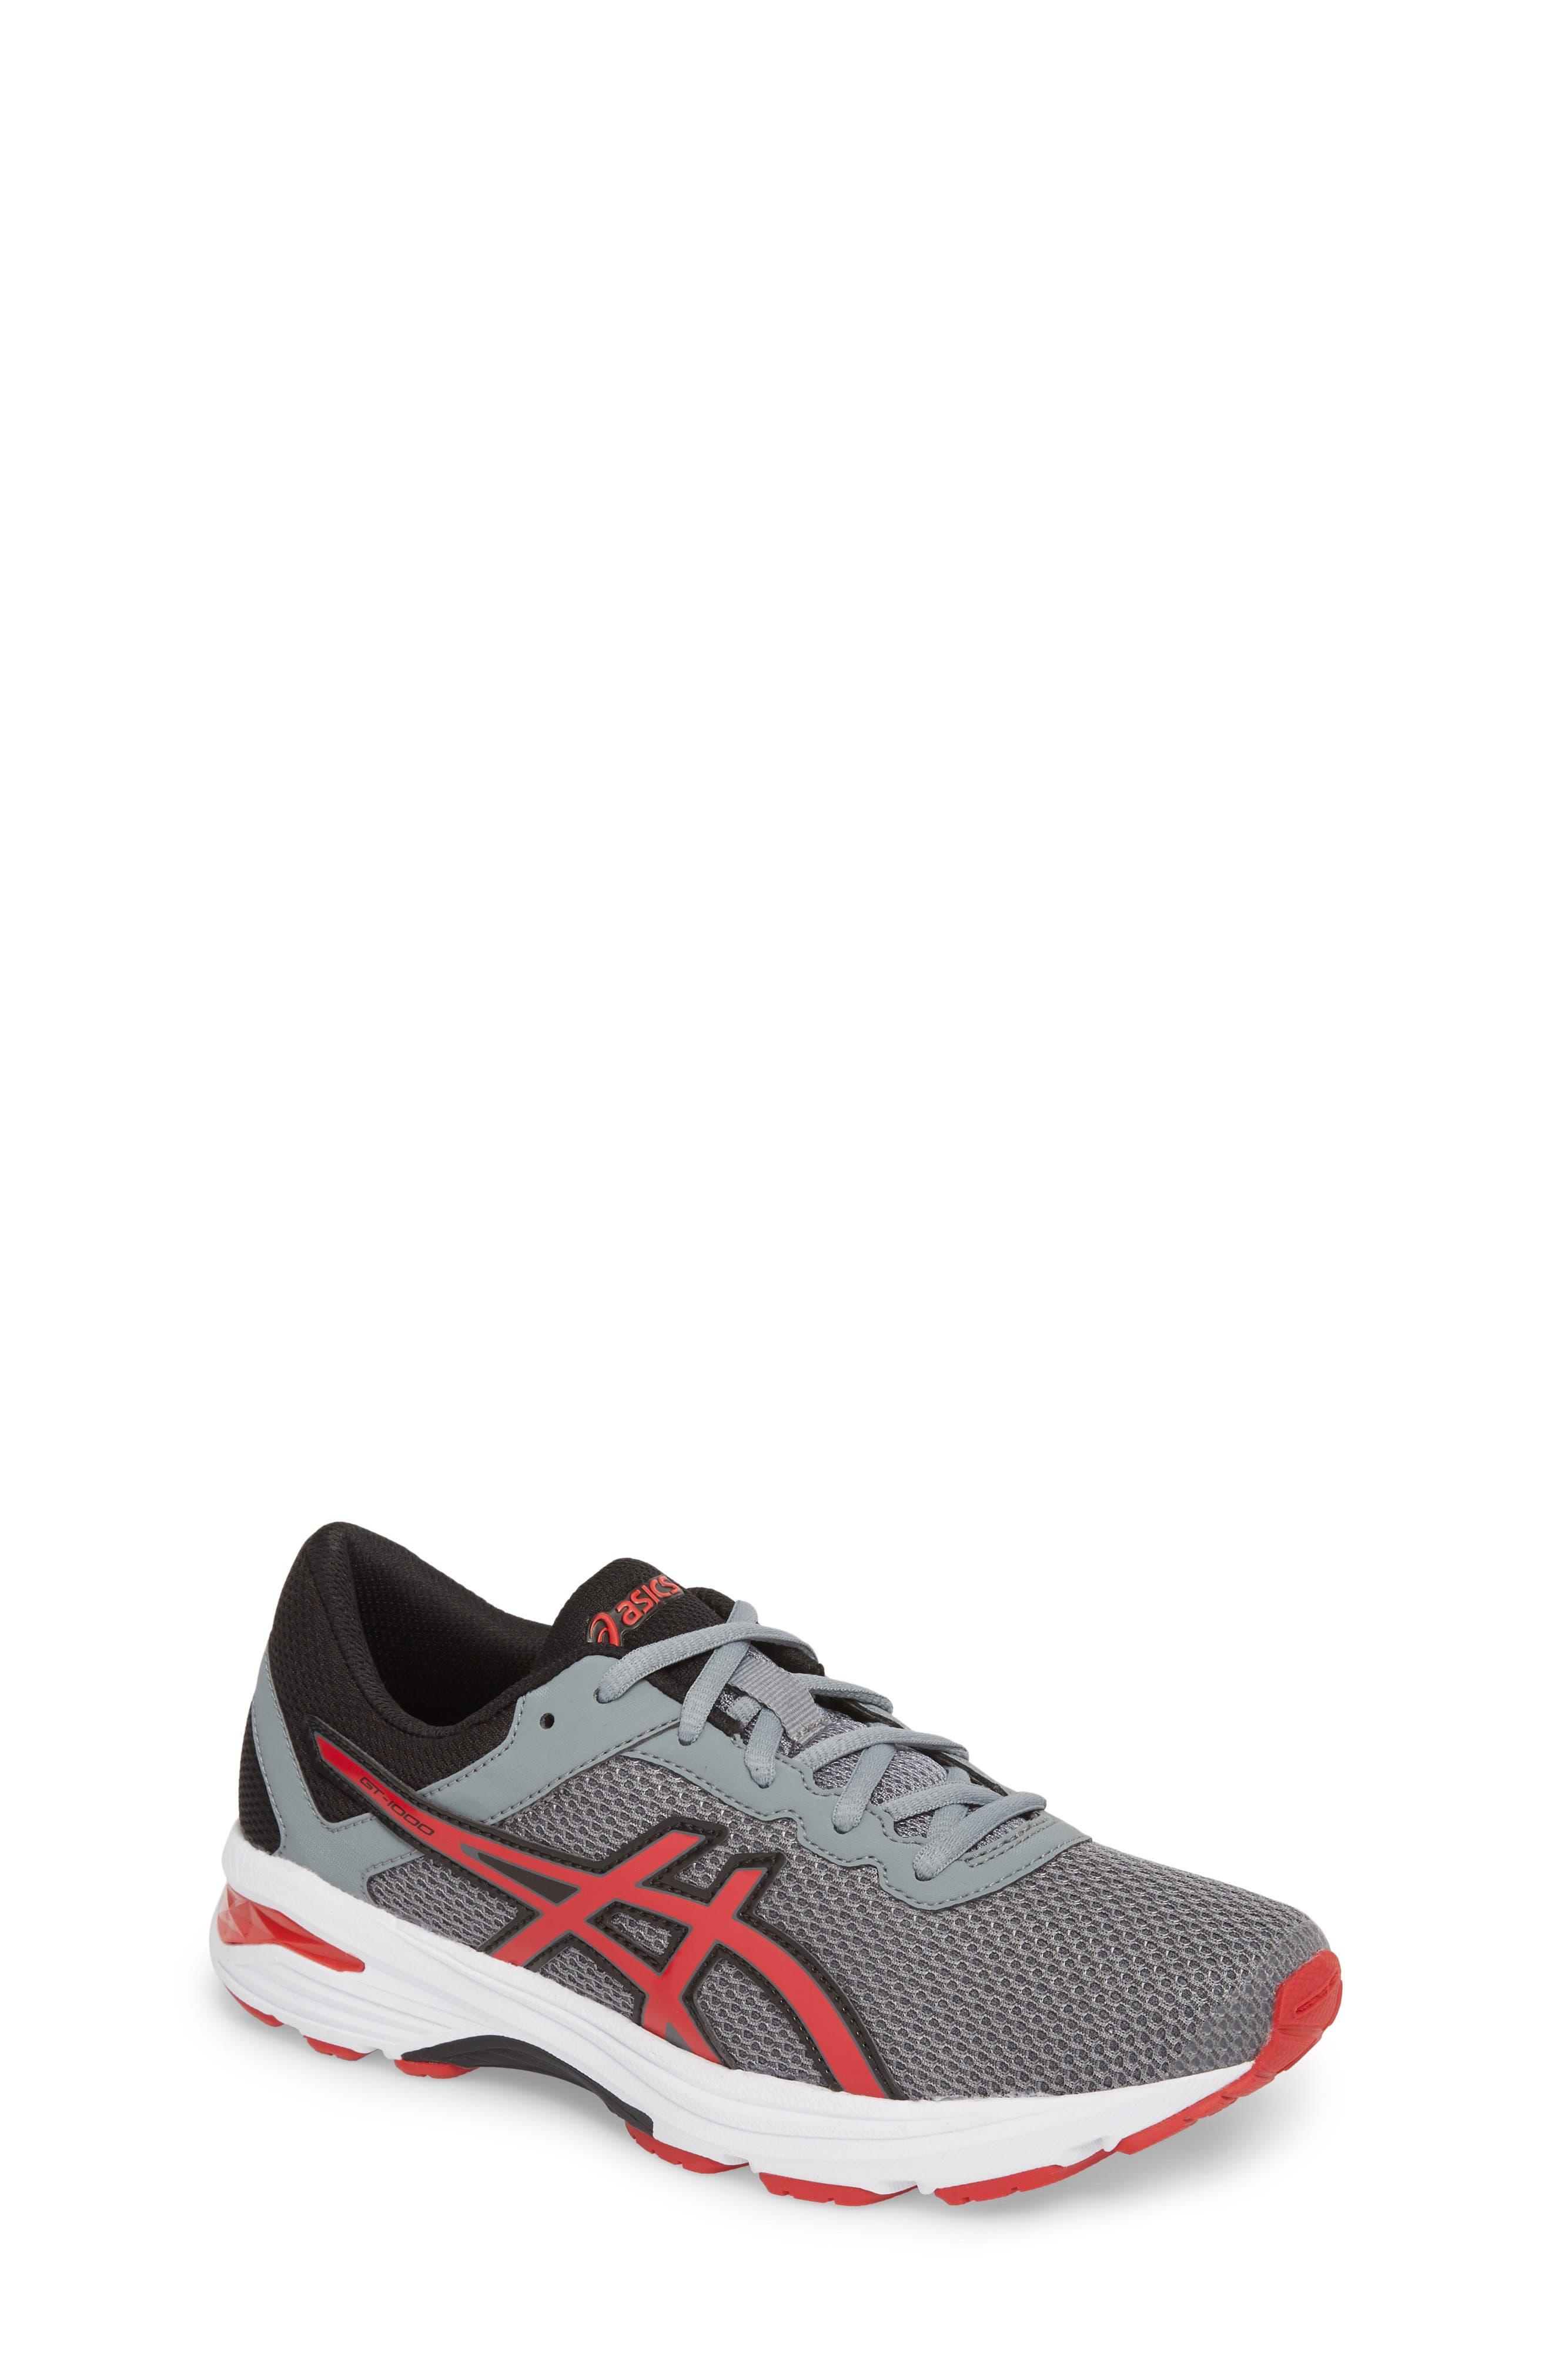 Asics GT-1000<sup>™</sup> 6 GS Sneaker,                             Main thumbnail 1, color,                             023